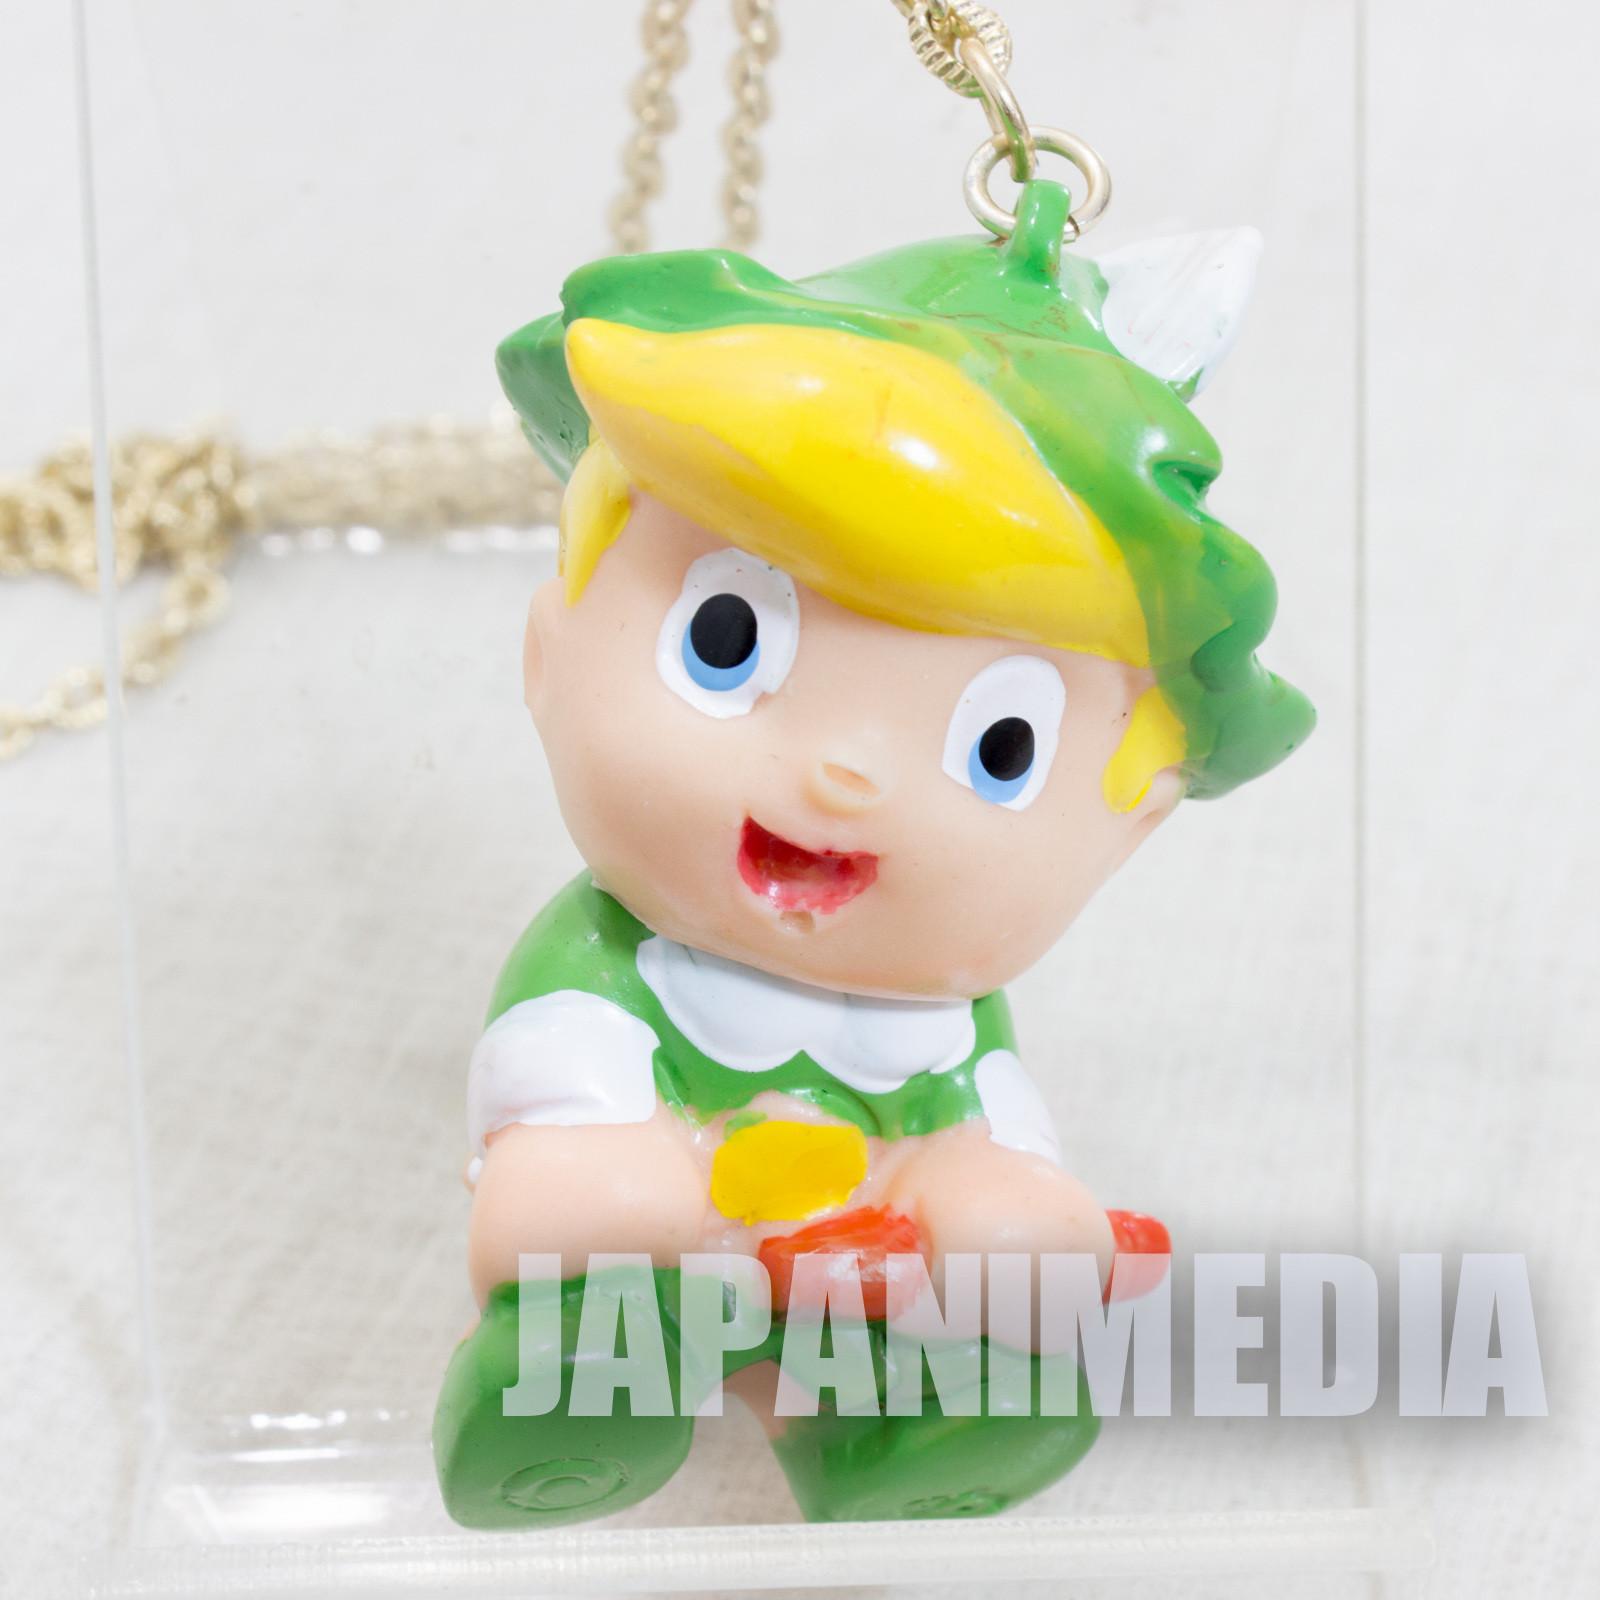 Retro Princess Knight Tink Mascot Soft Vinyl Figure Necklace Tezuka Osamu JAPAN